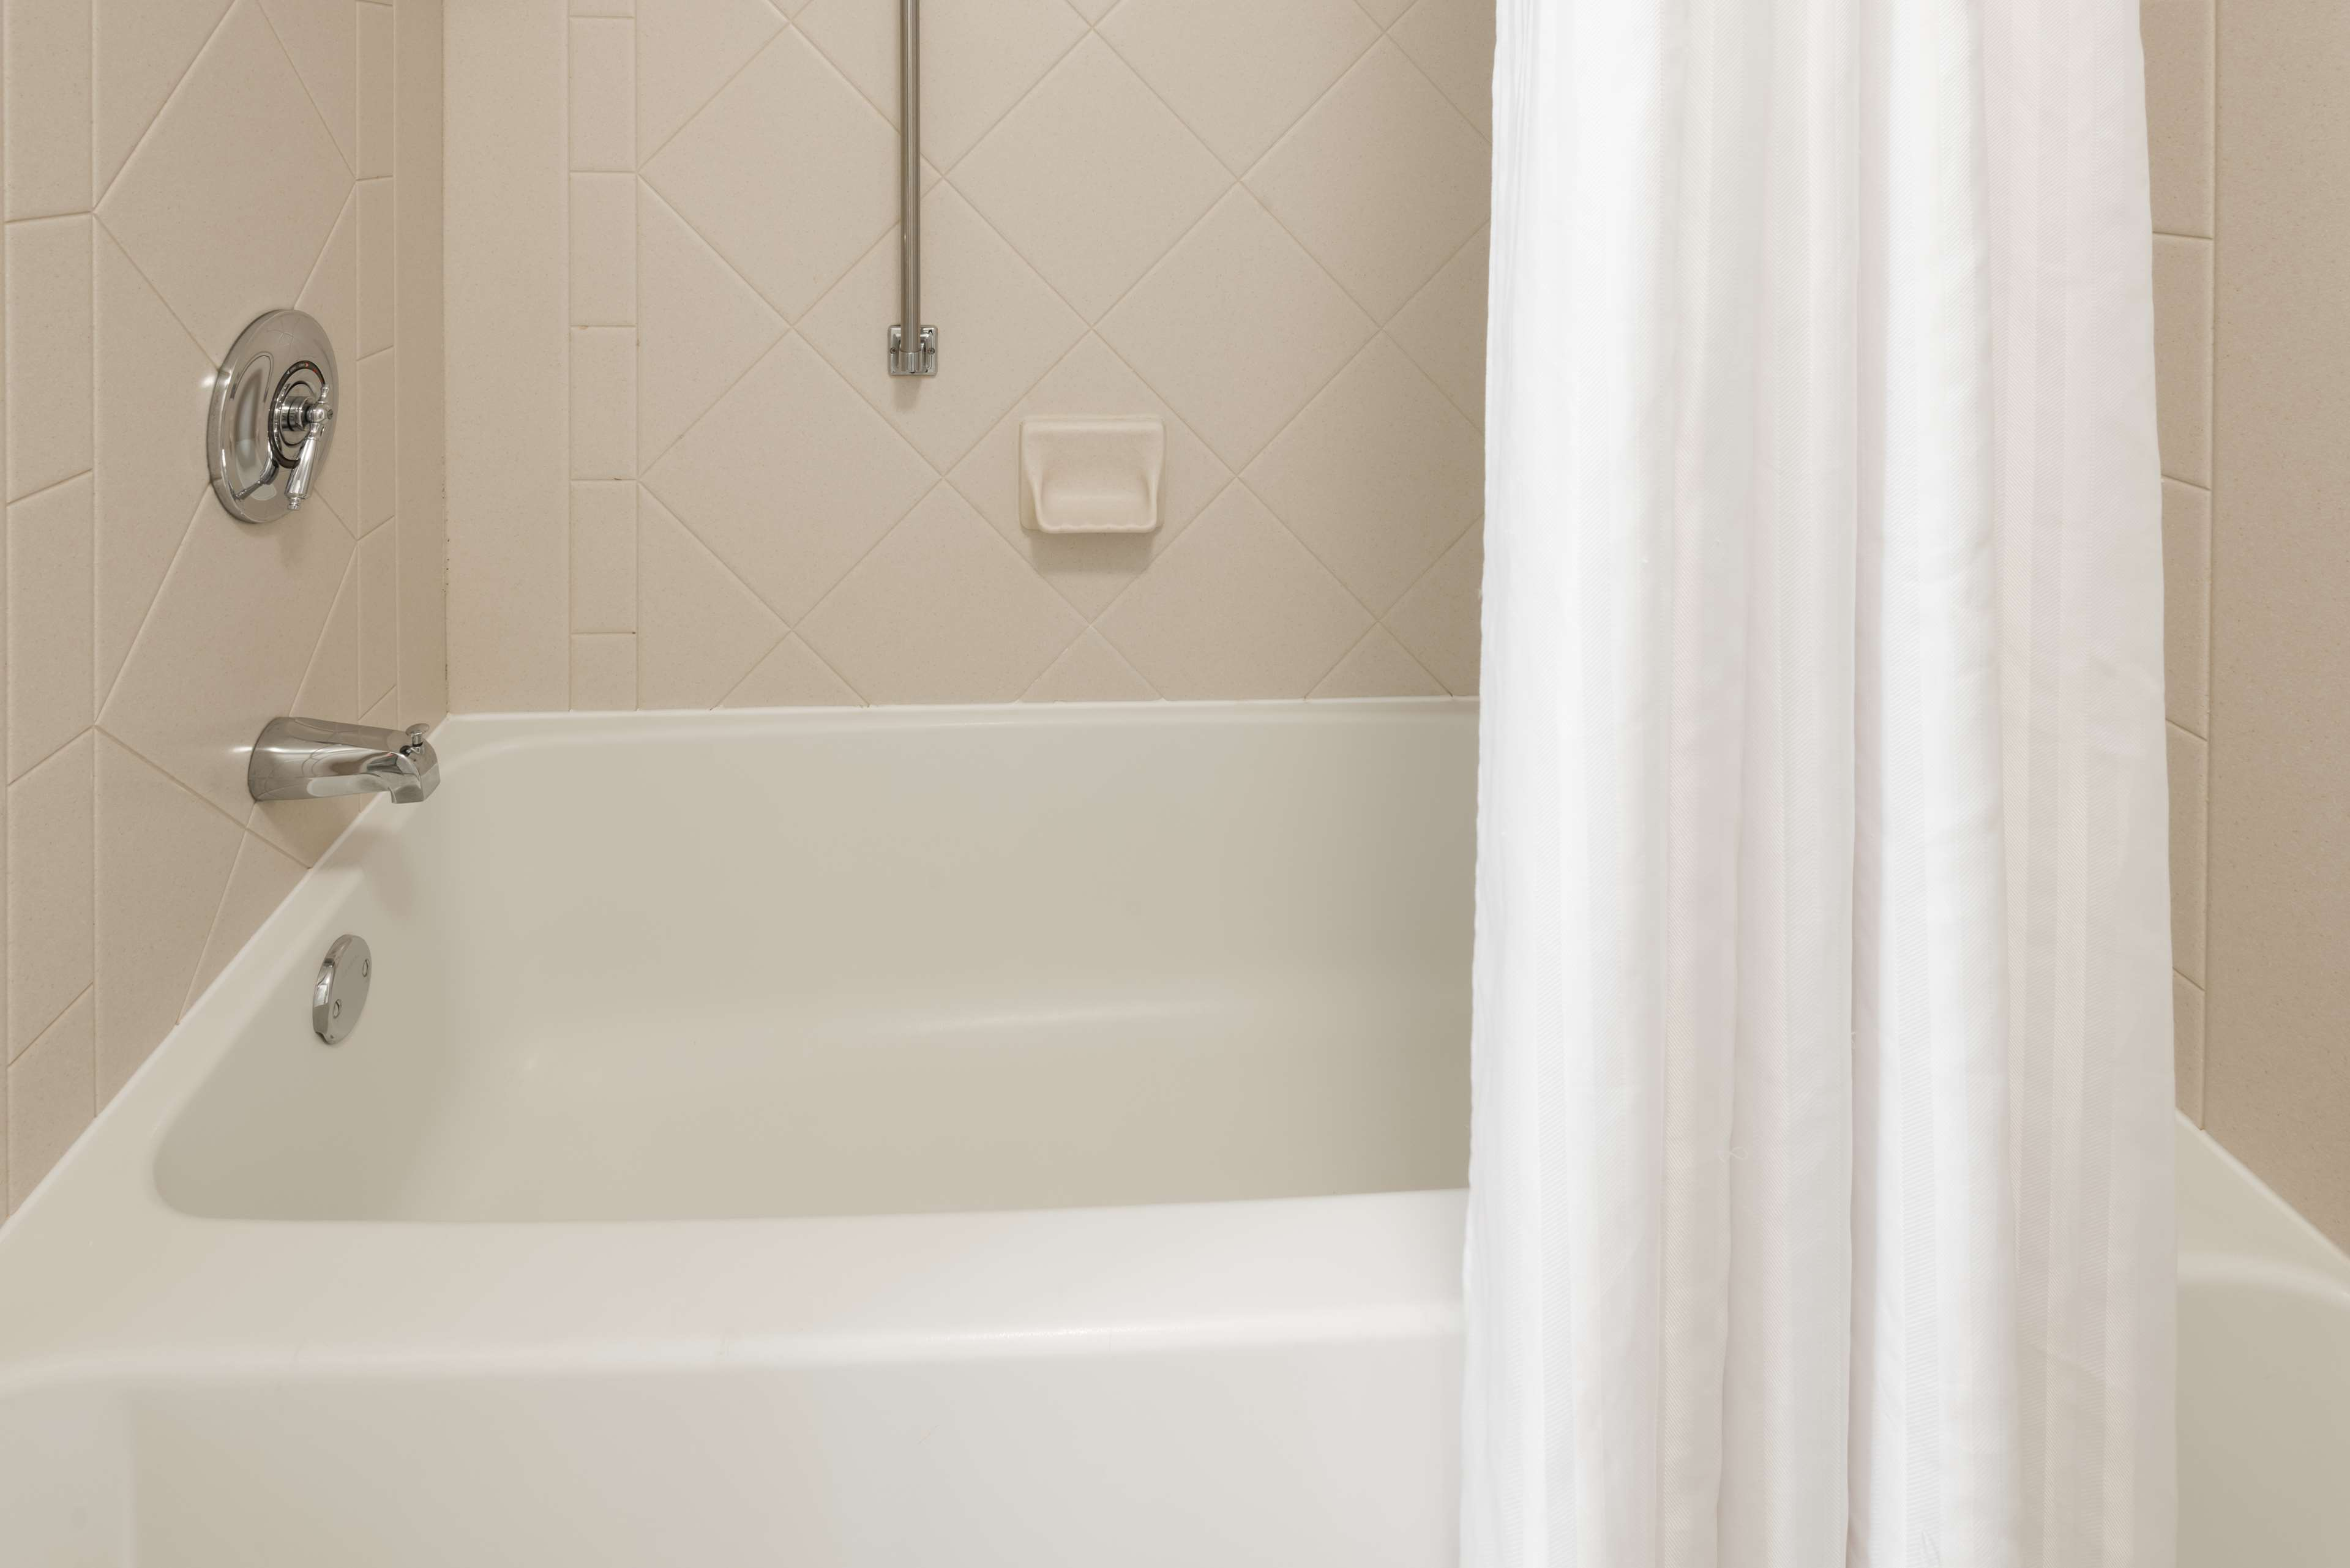 Homewood Suites by Hilton Holyoke-Springfield/North image 15